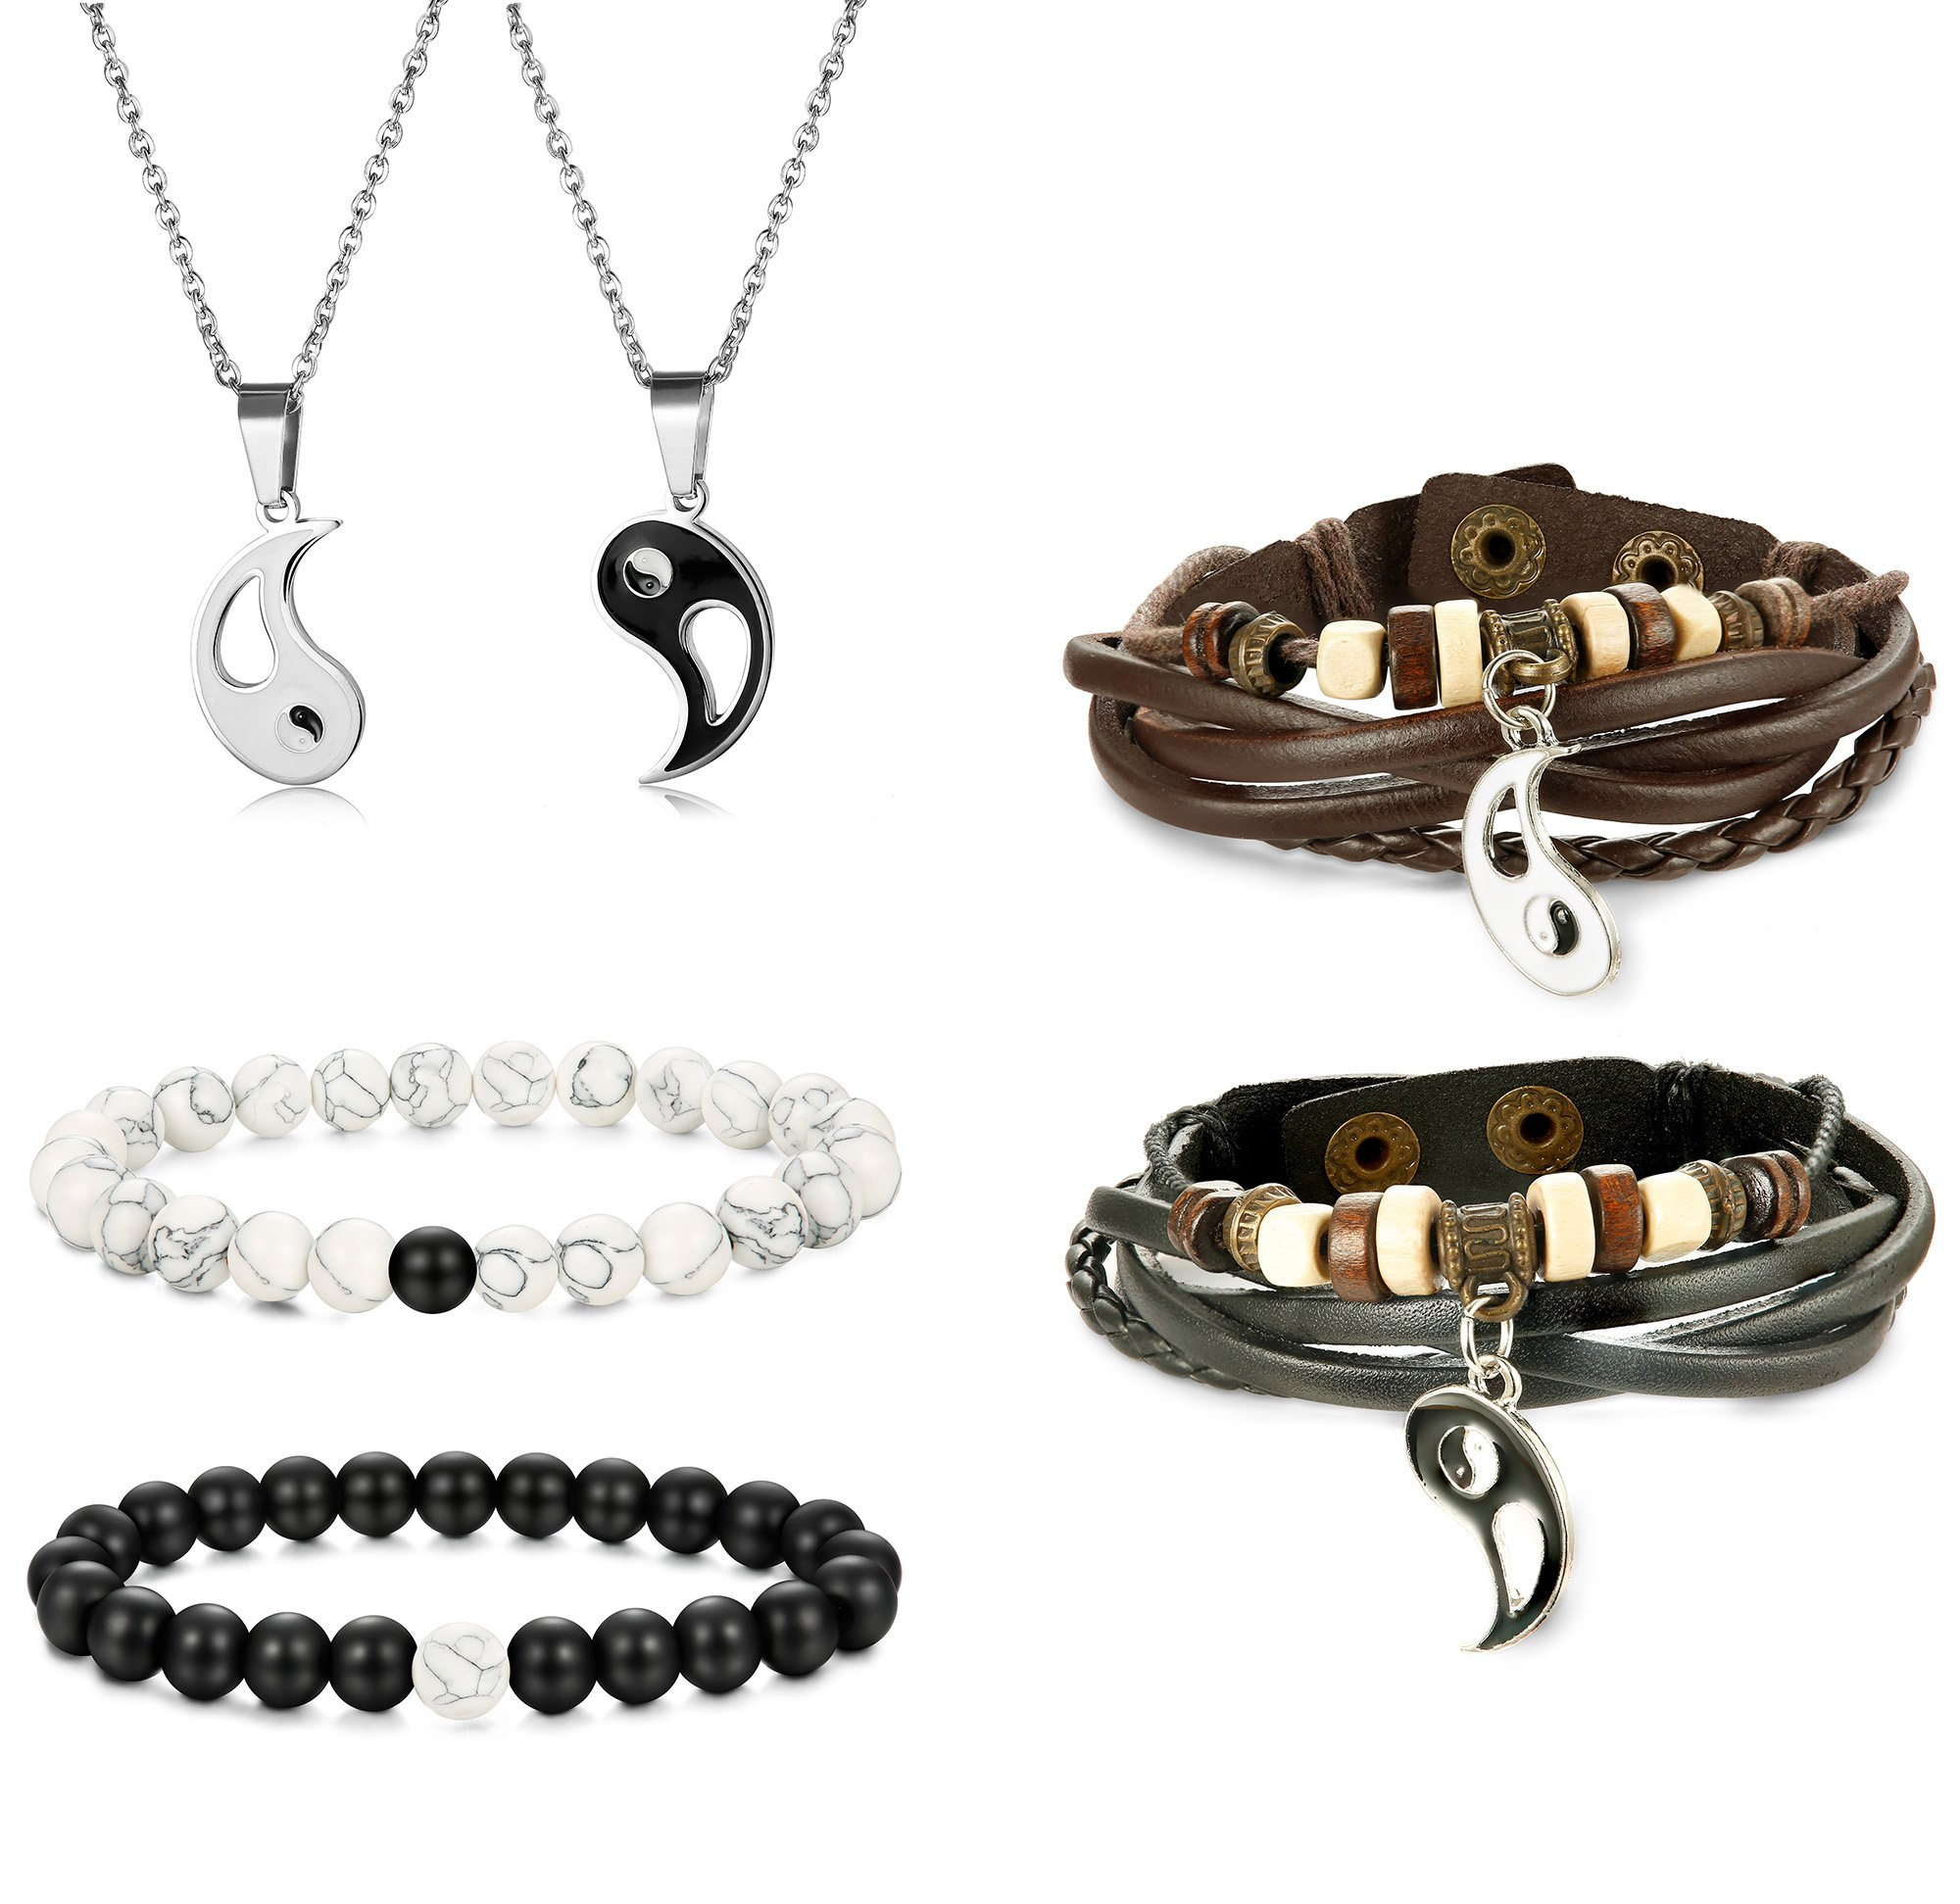 Jstyle Yin Yang Couples Necklace Bracelets for Women Mens Distance Leather Beaded Bracelet Adjustable 3Sets by Jstyle (Image #1)